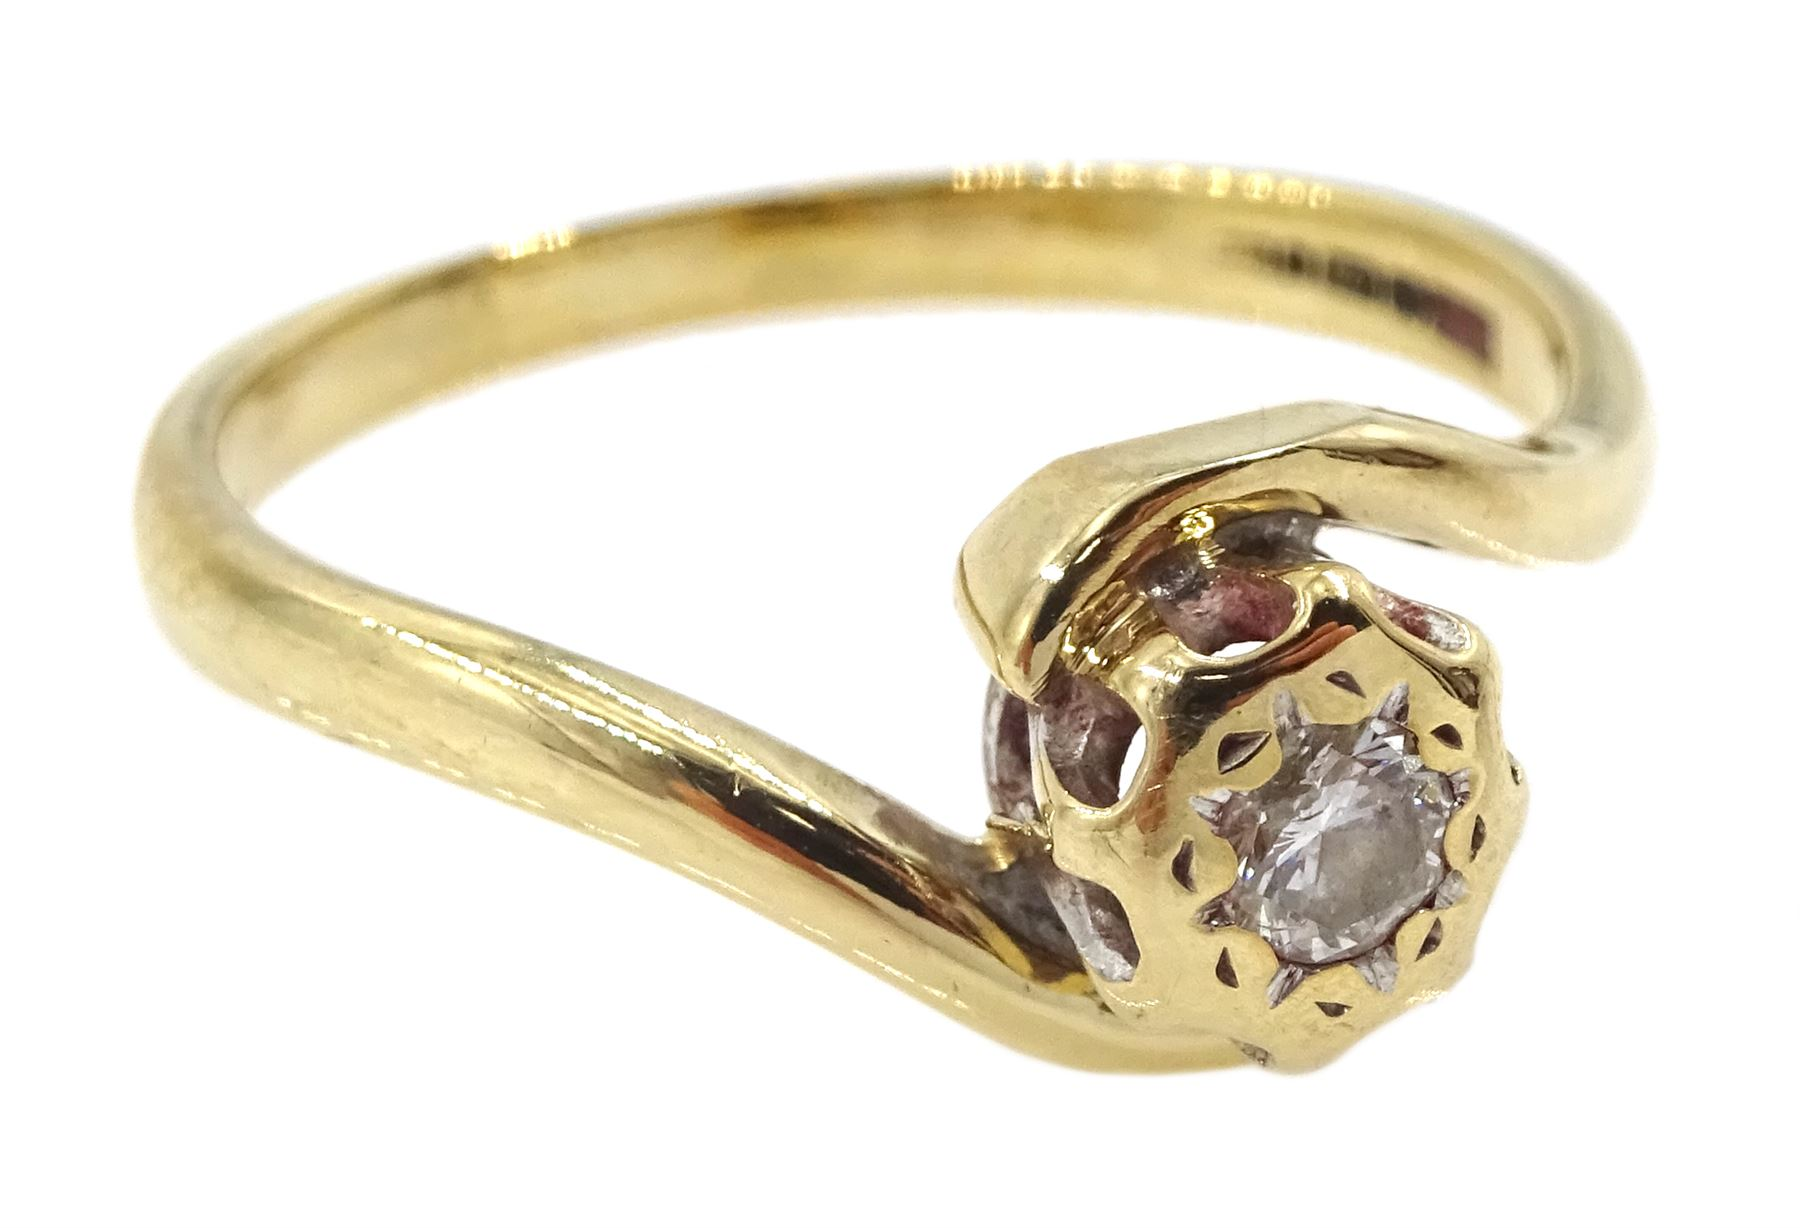 9ct gold single stone diamond ring - Image 3 of 4